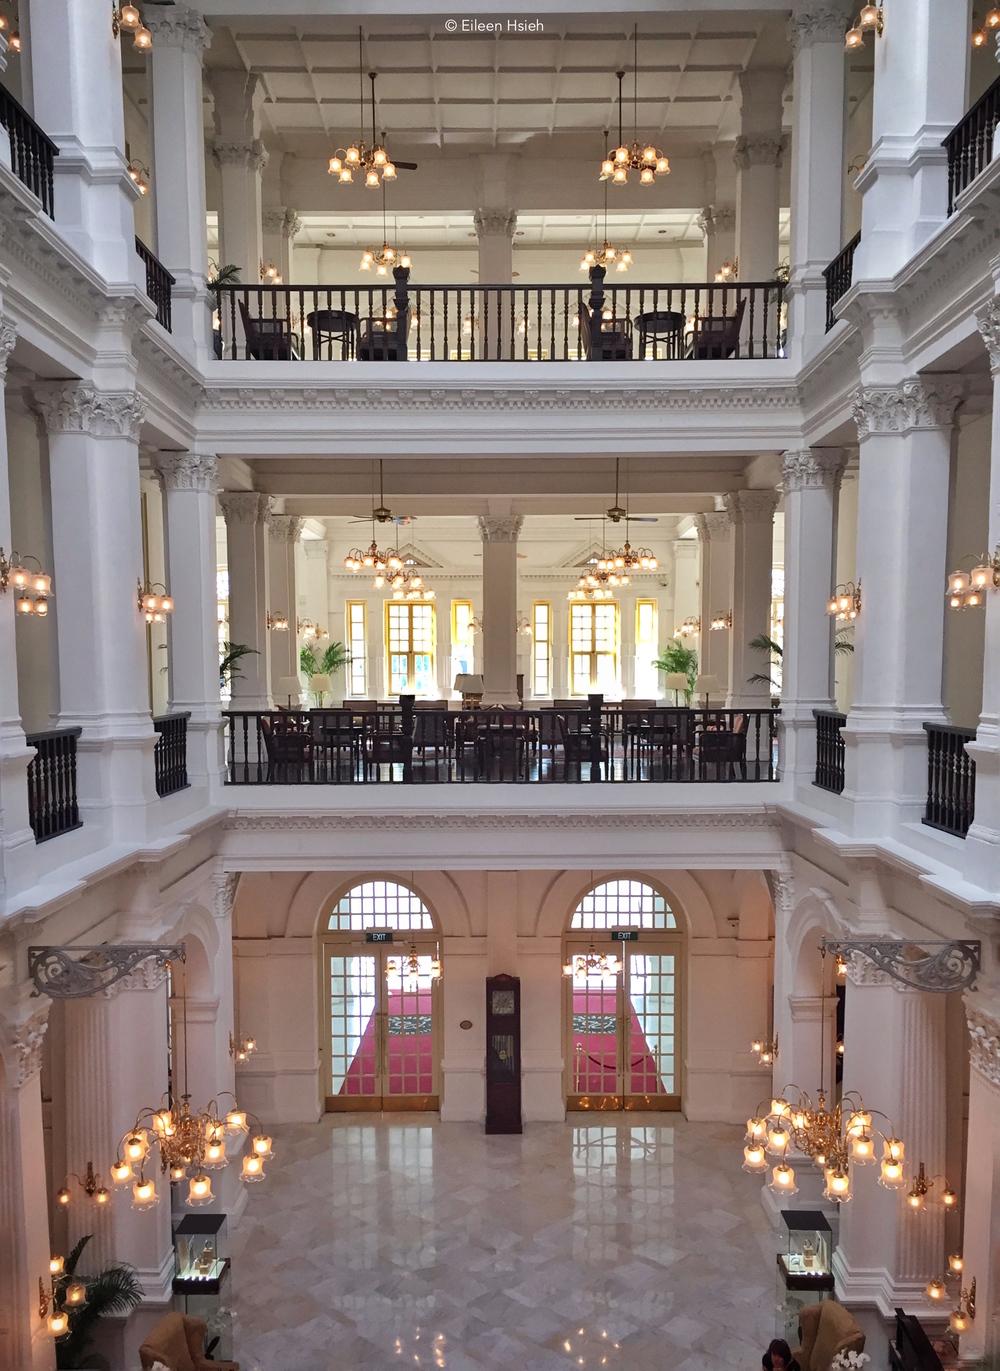 Inside Raffles Hotel's main lobby.© Eileen Hsieh